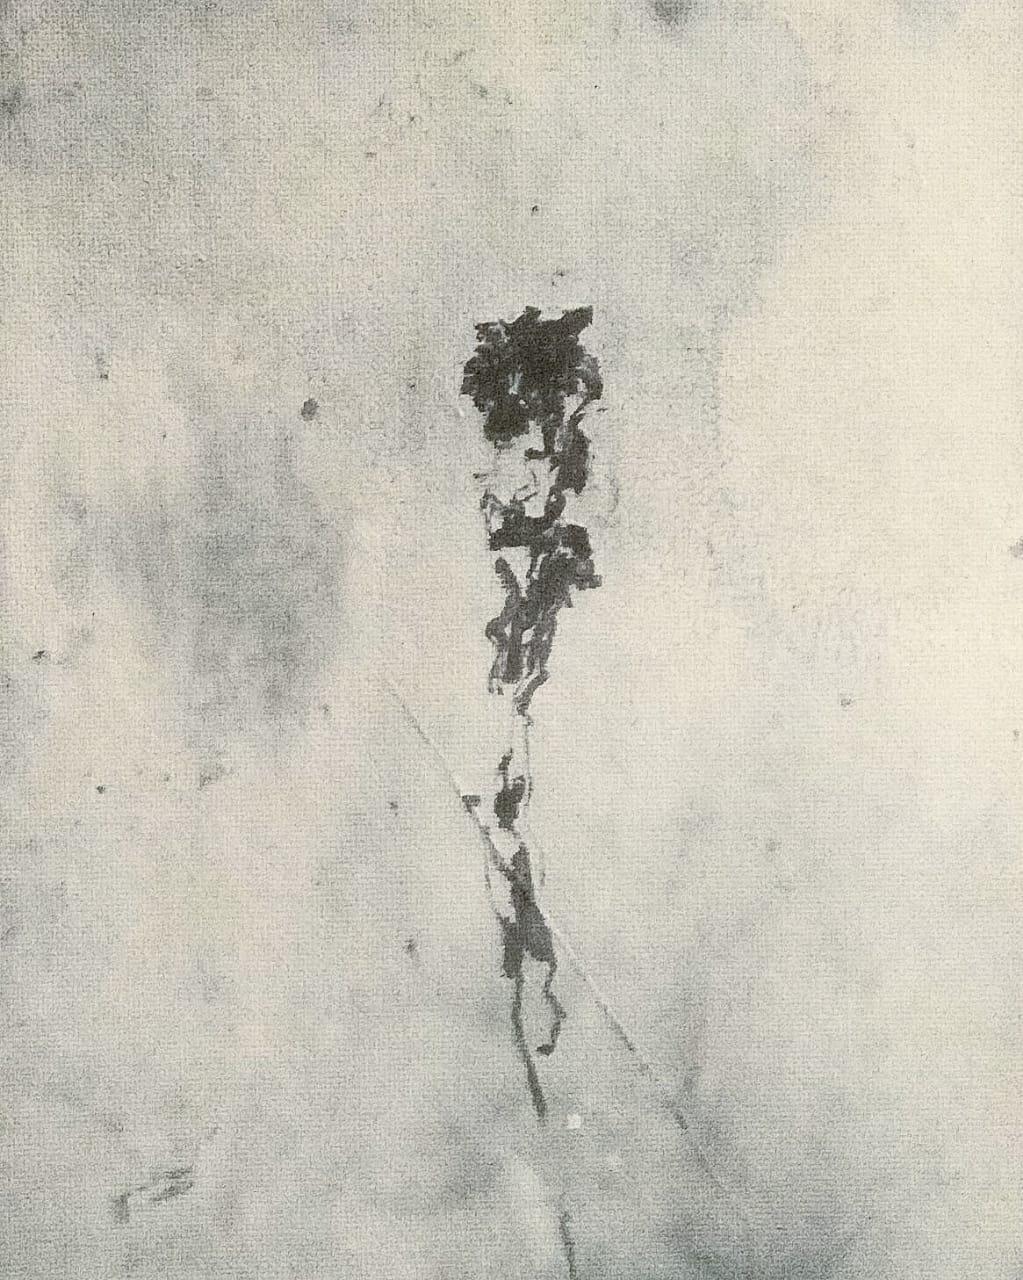 Sasha Vladimirovich Lis. Black Rose